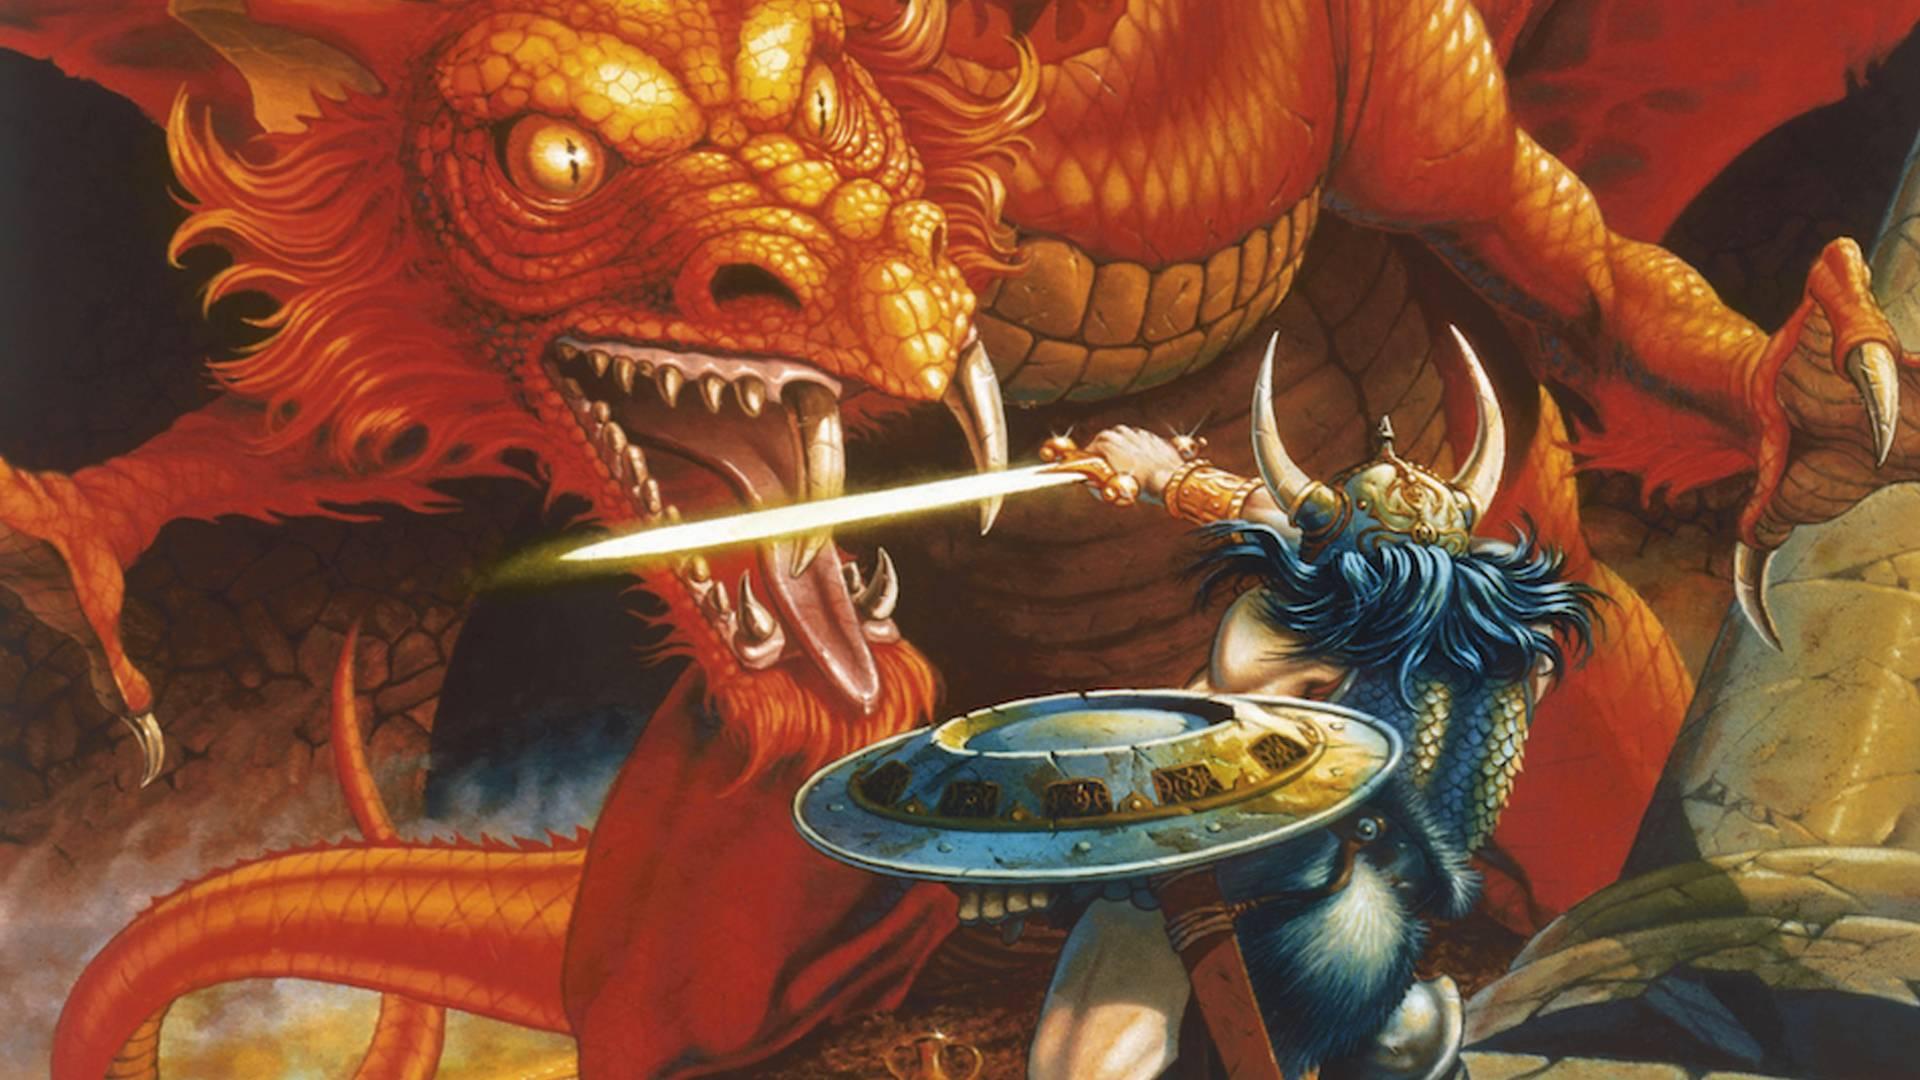 Dungeons & Dragons: iniziano le riprese del film [FOTO]